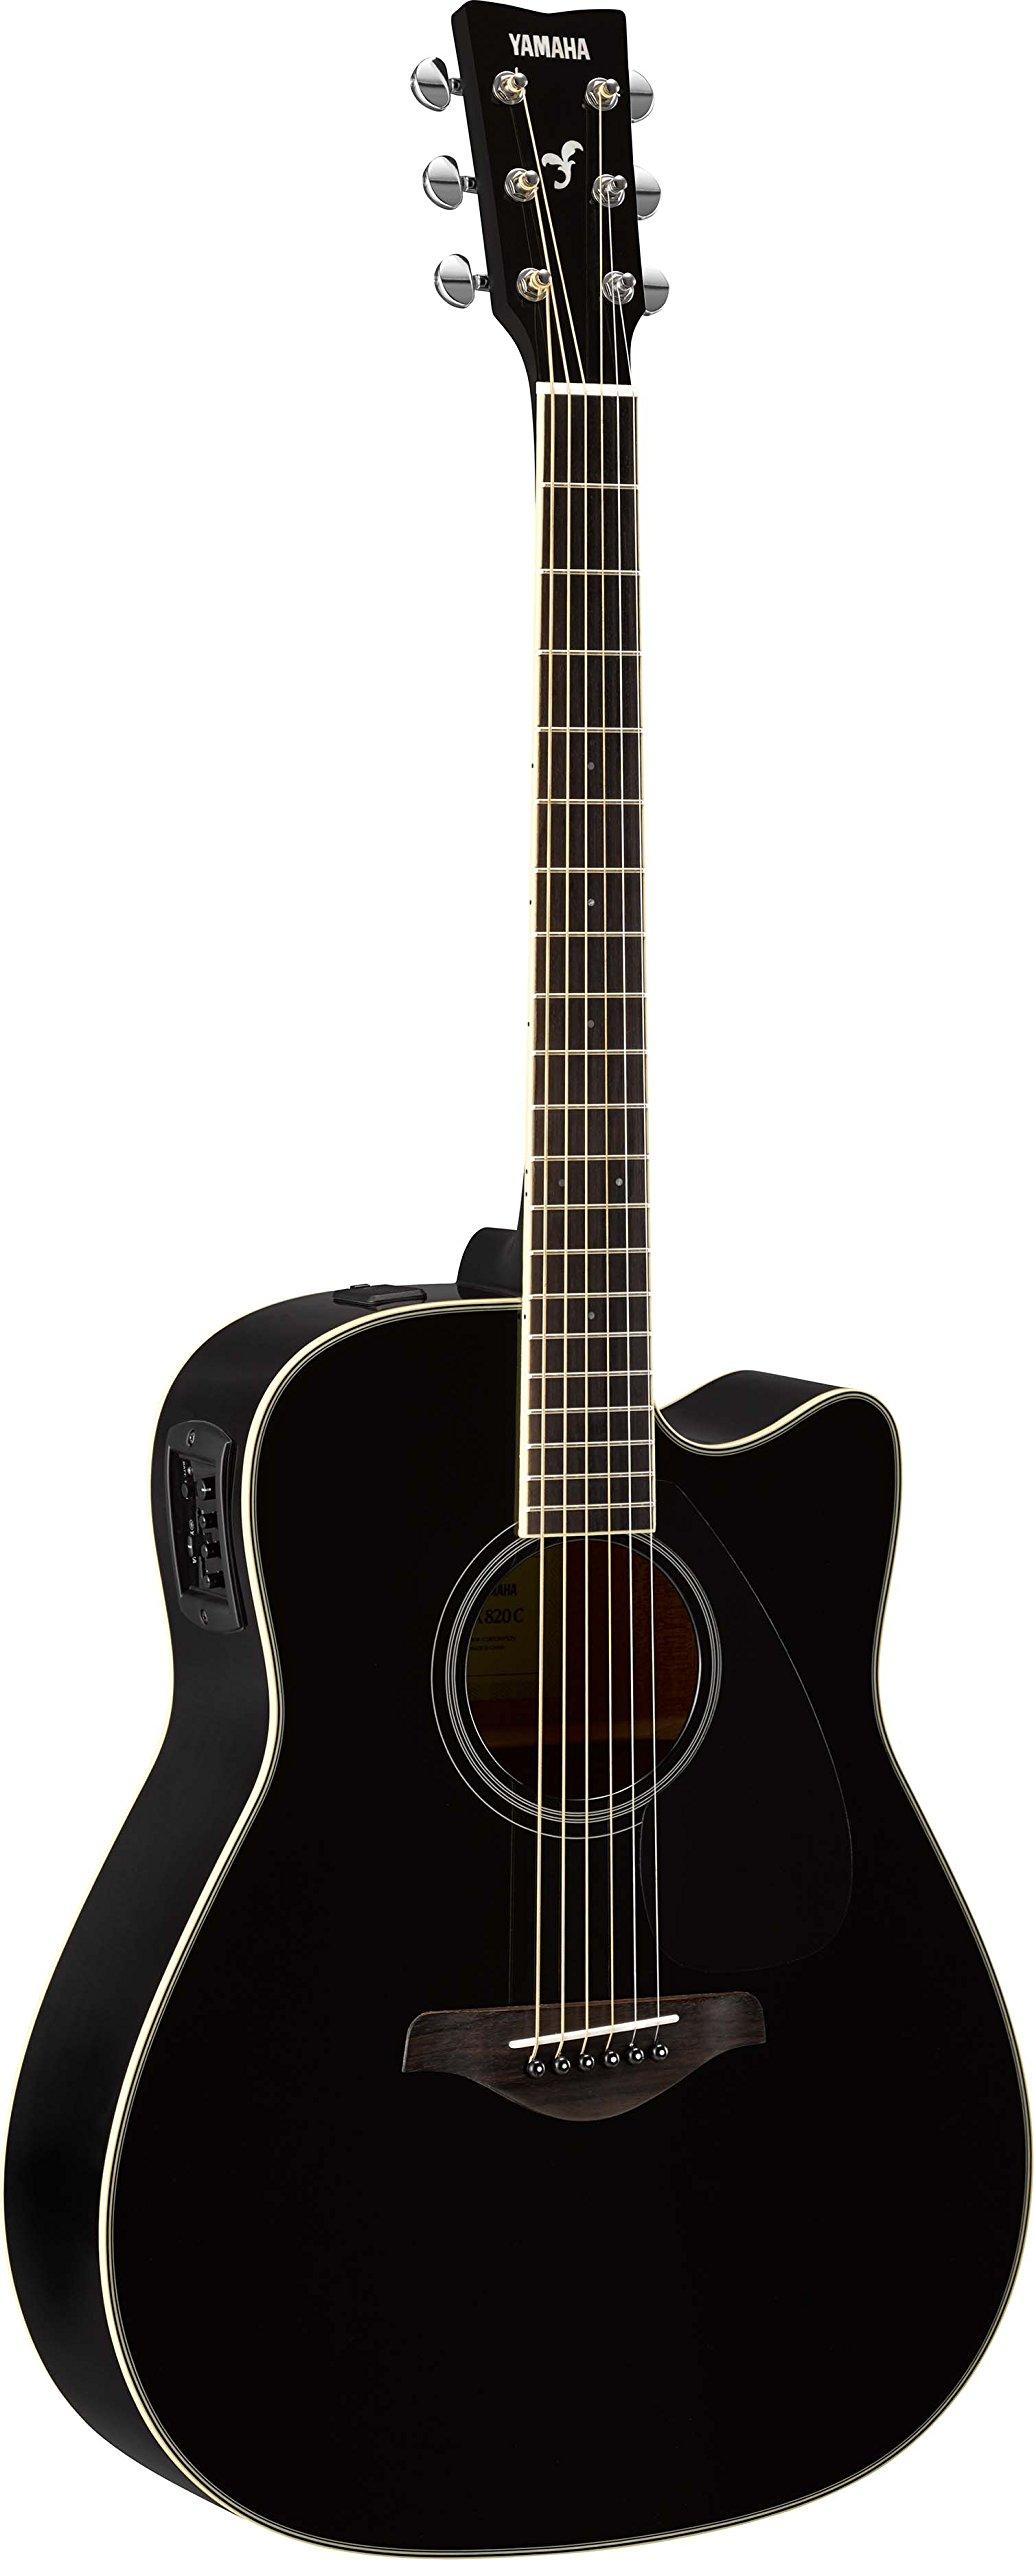 Yamaha FGX820C Solid Top Cutaway Acoustic-Electric Guitar, Black